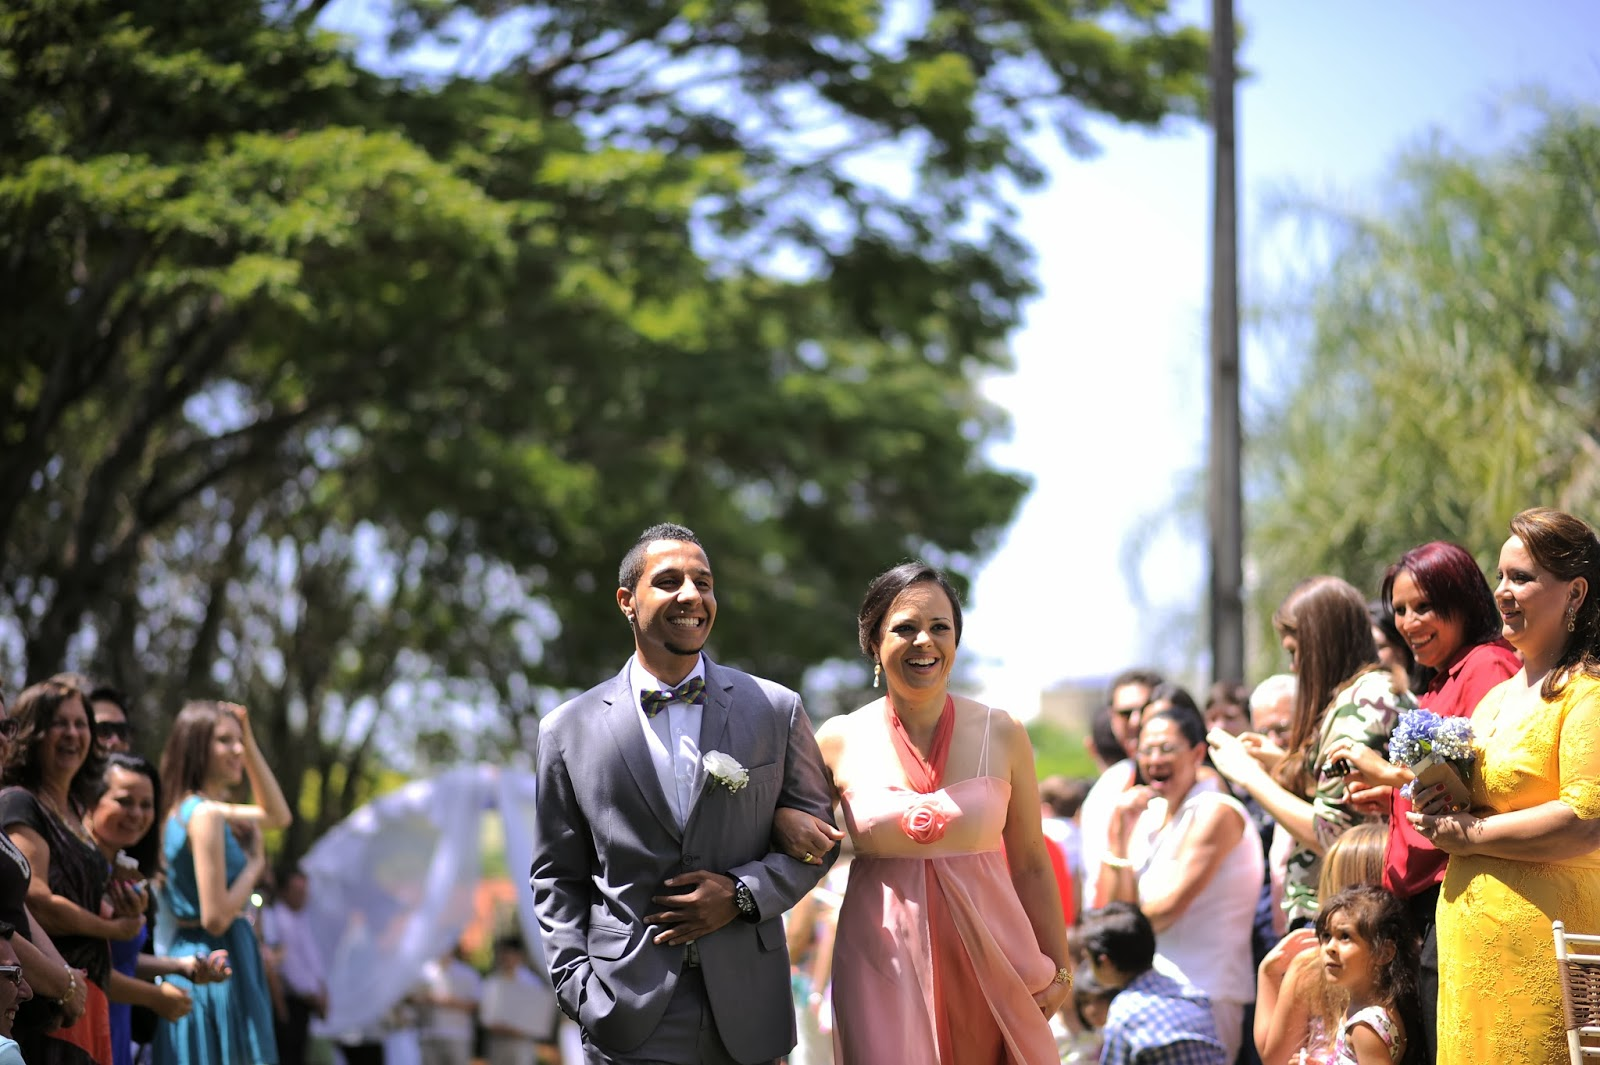 cerimonia-entrada-noivo-casamento-dia-azul-amarelo